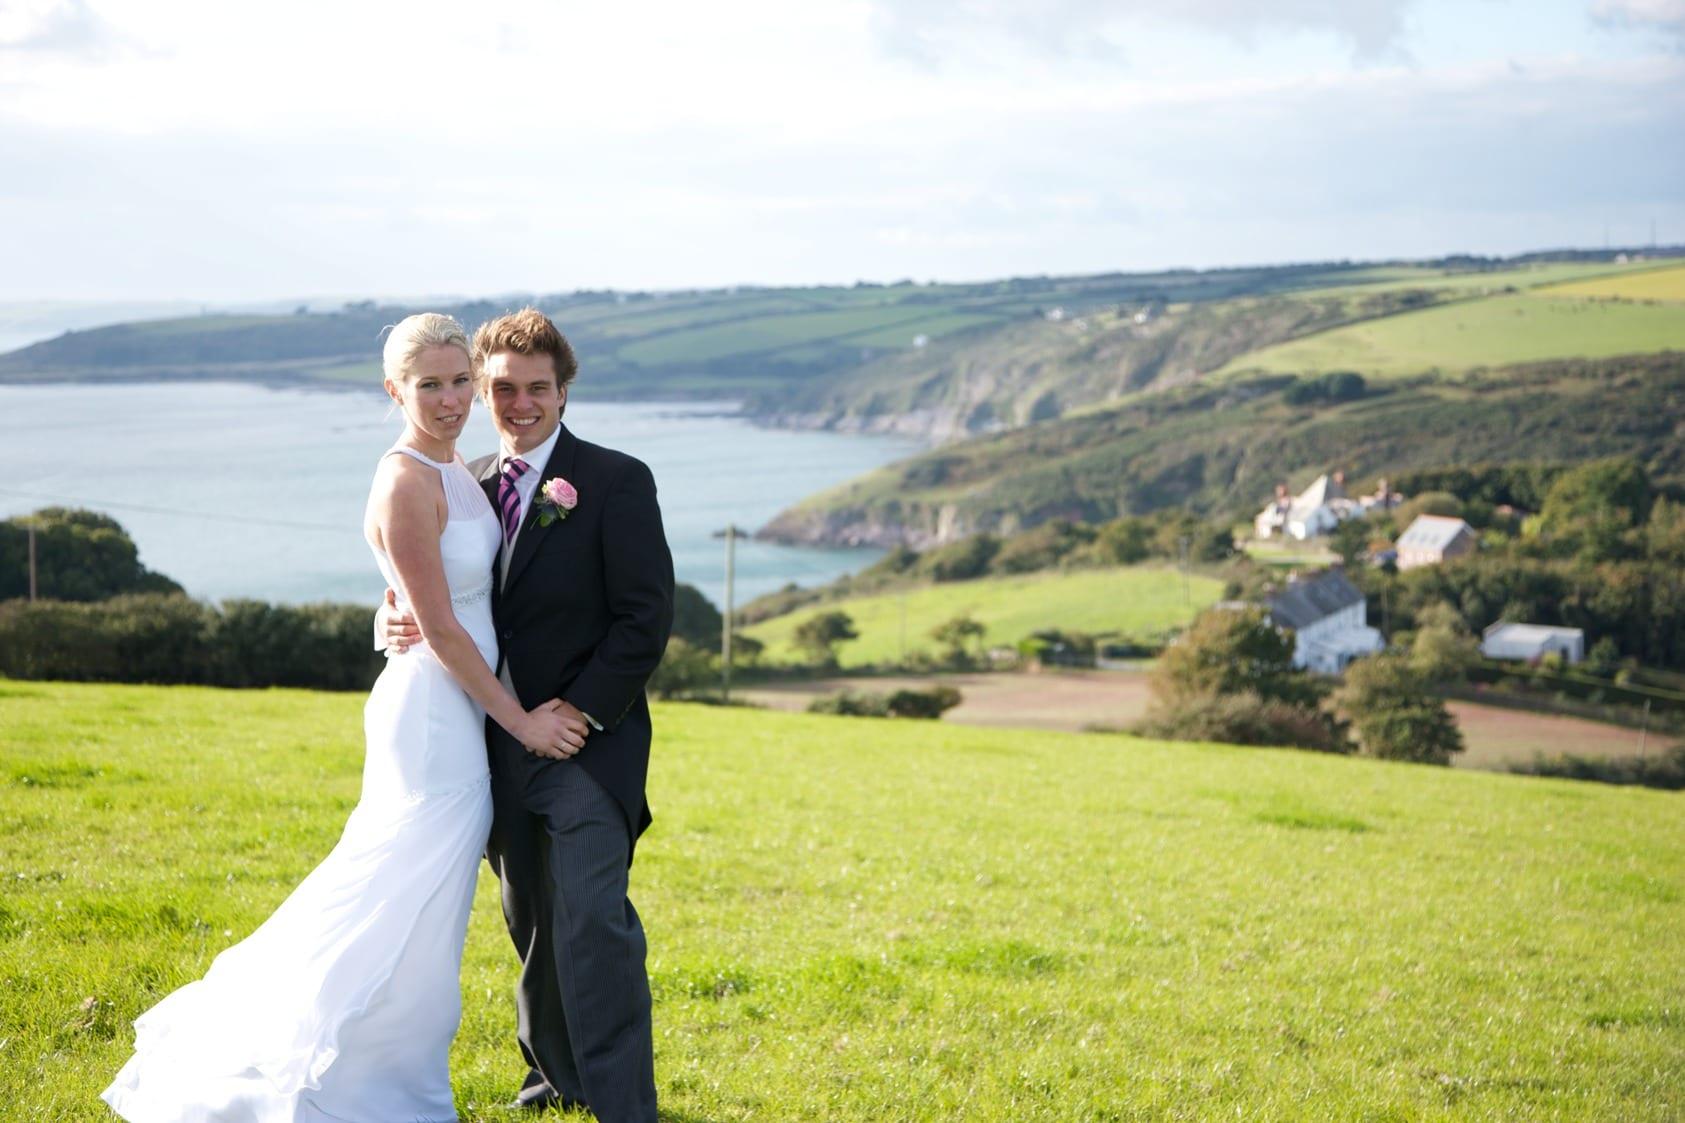 Worswell Barton Devon Wedding Venue